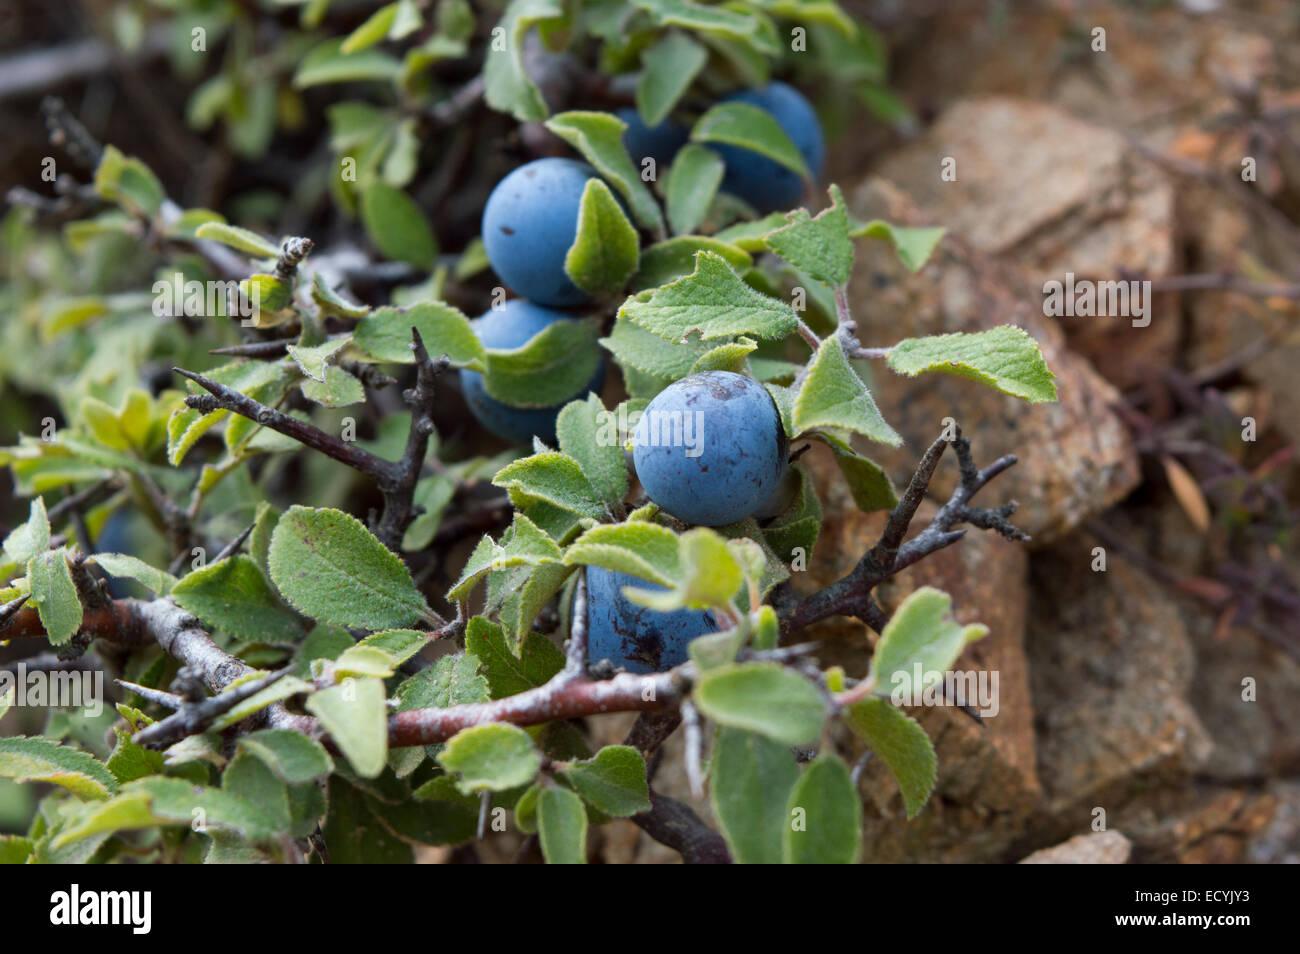 wild blueberry stockfotos wild blueberry bilder alamy. Black Bedroom Furniture Sets. Home Design Ideas